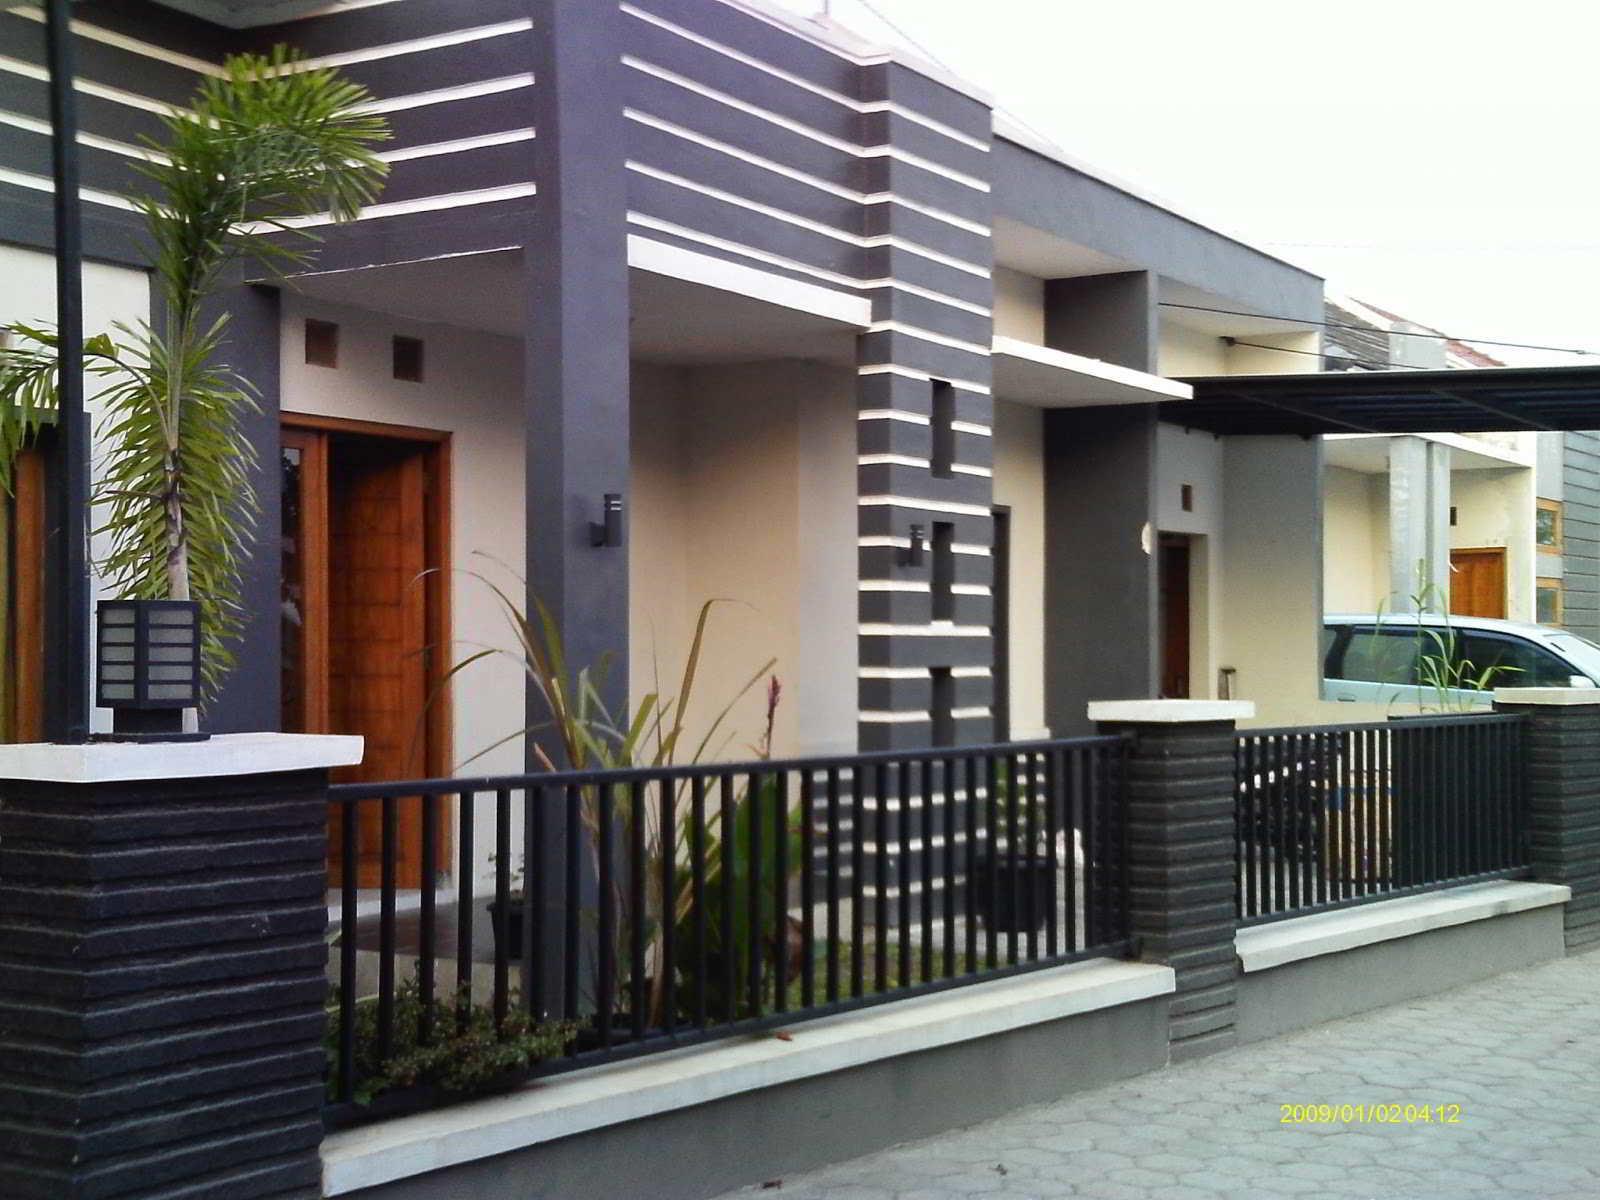 Contoh Model Pagar Rumah Terbaru Besi Modern